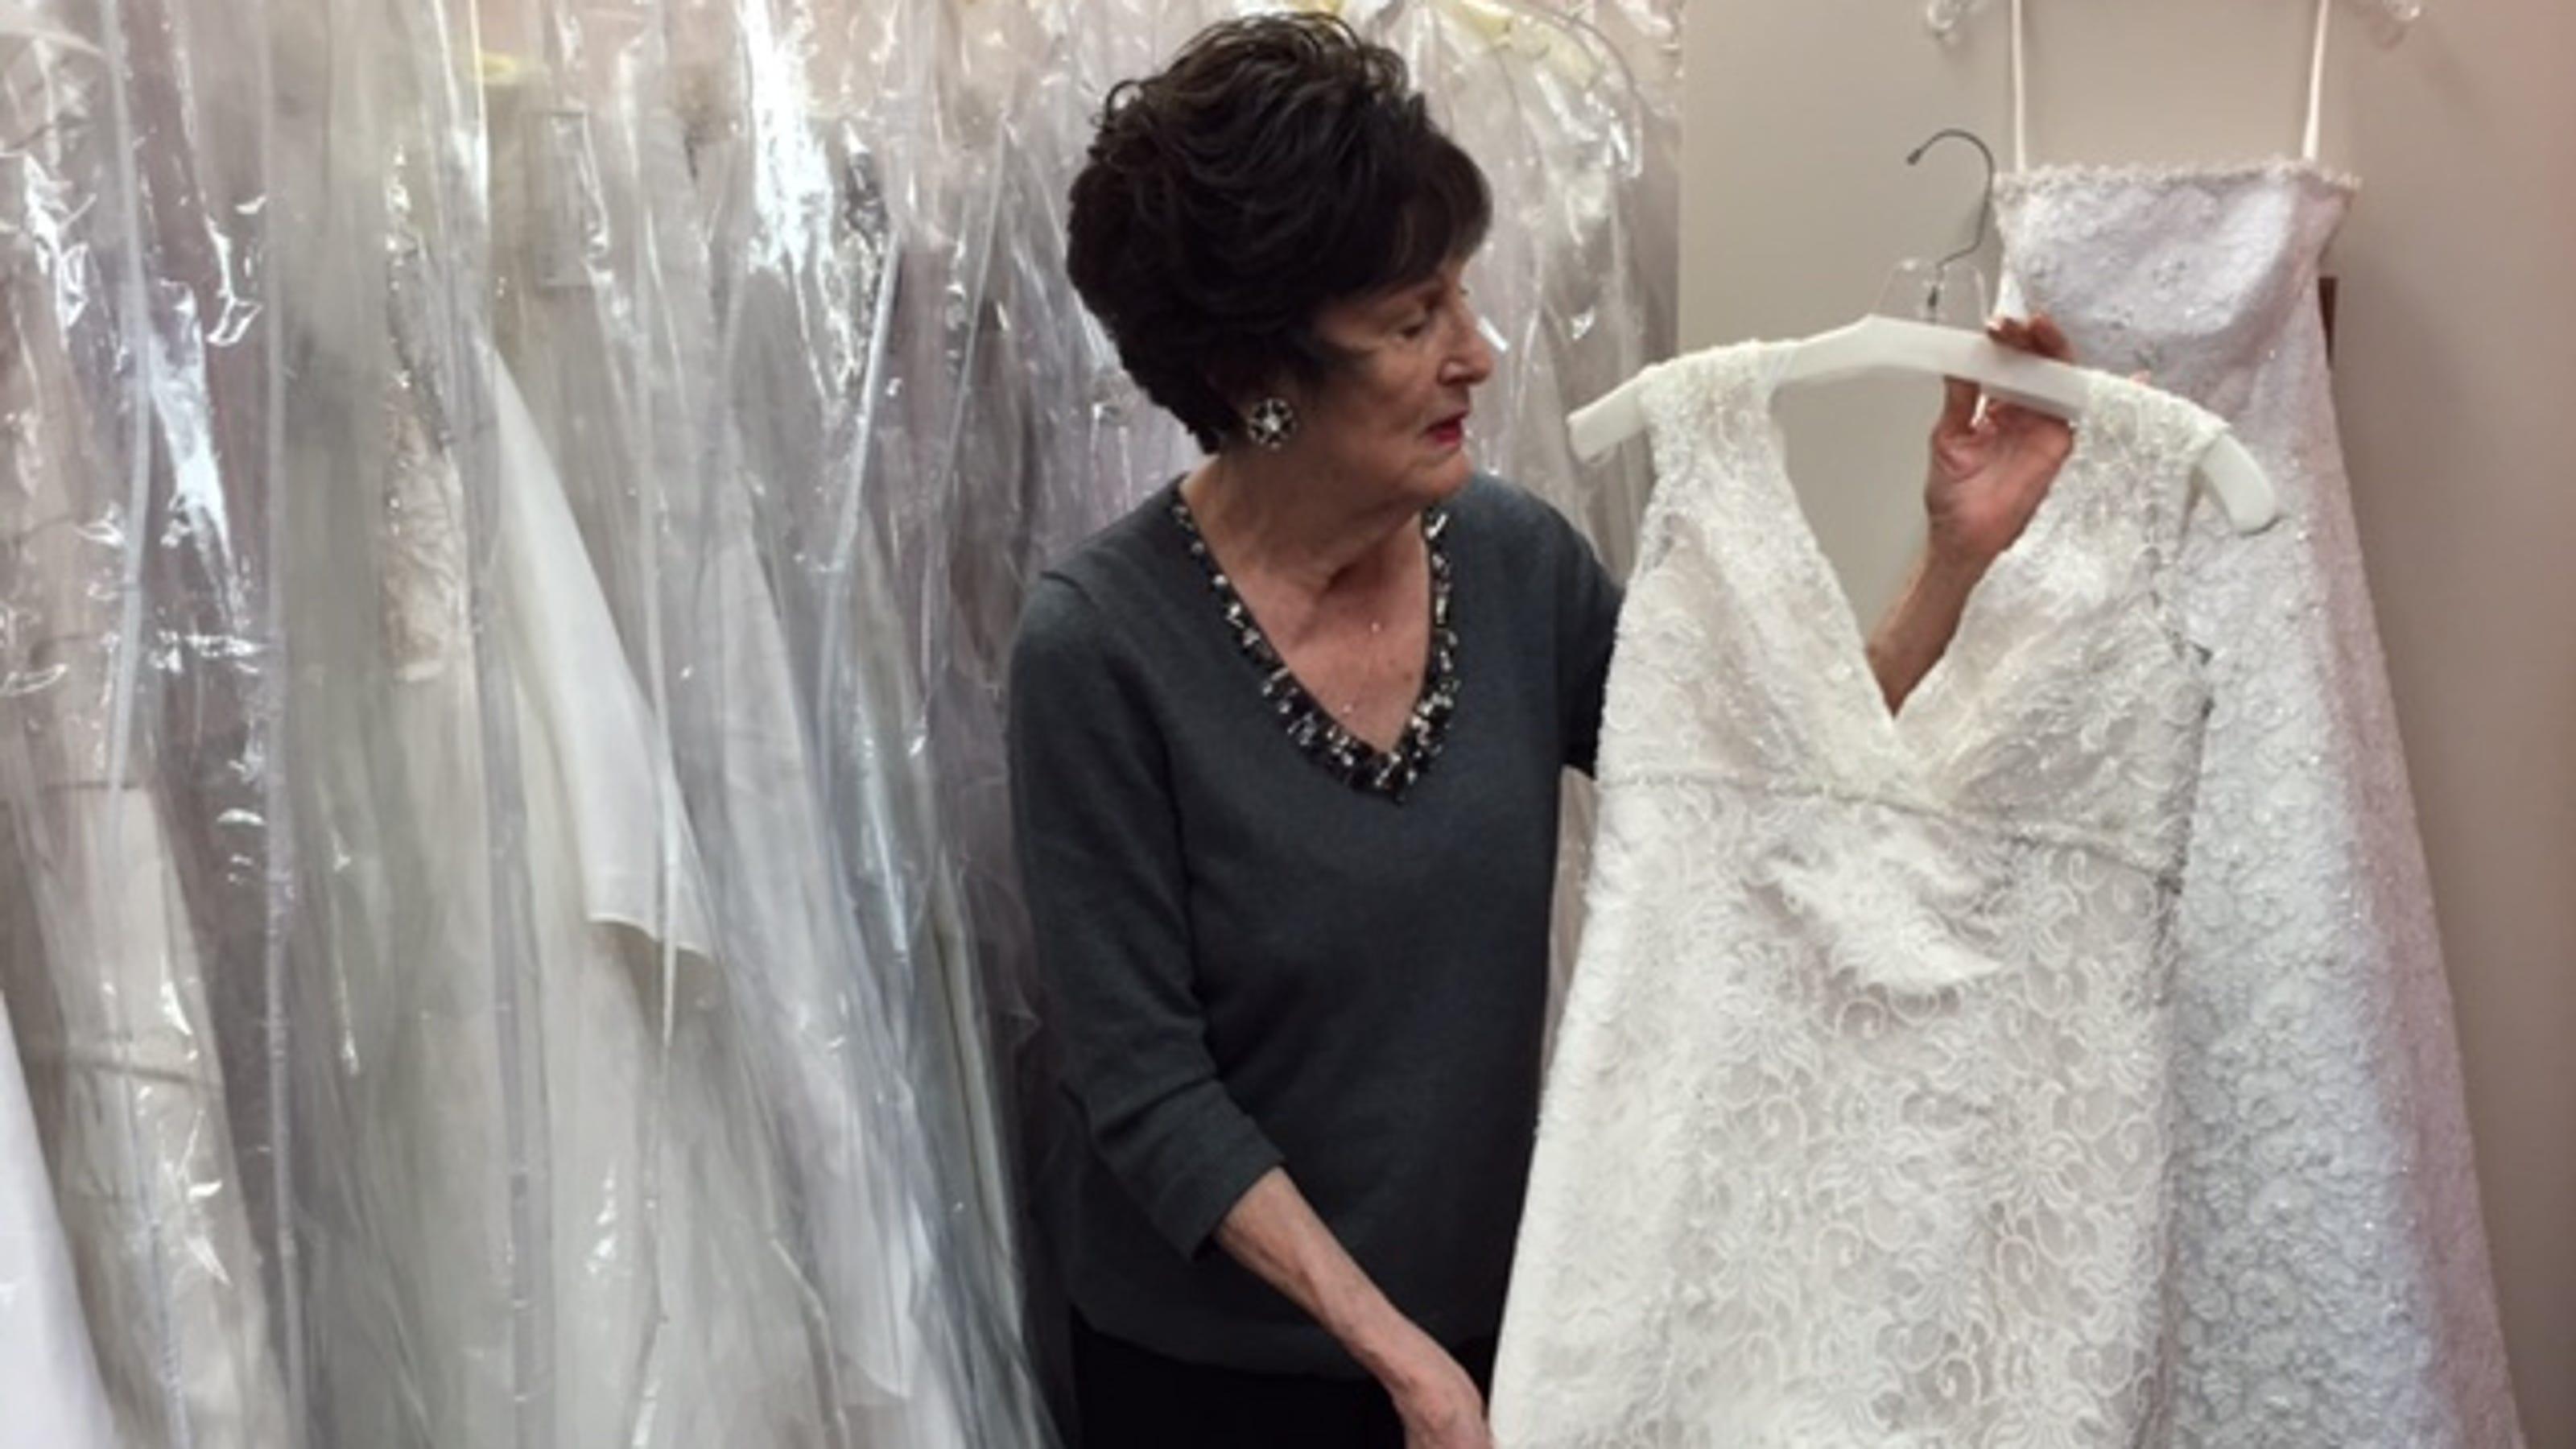 Wedding Dress Deals For Brides On A Budget